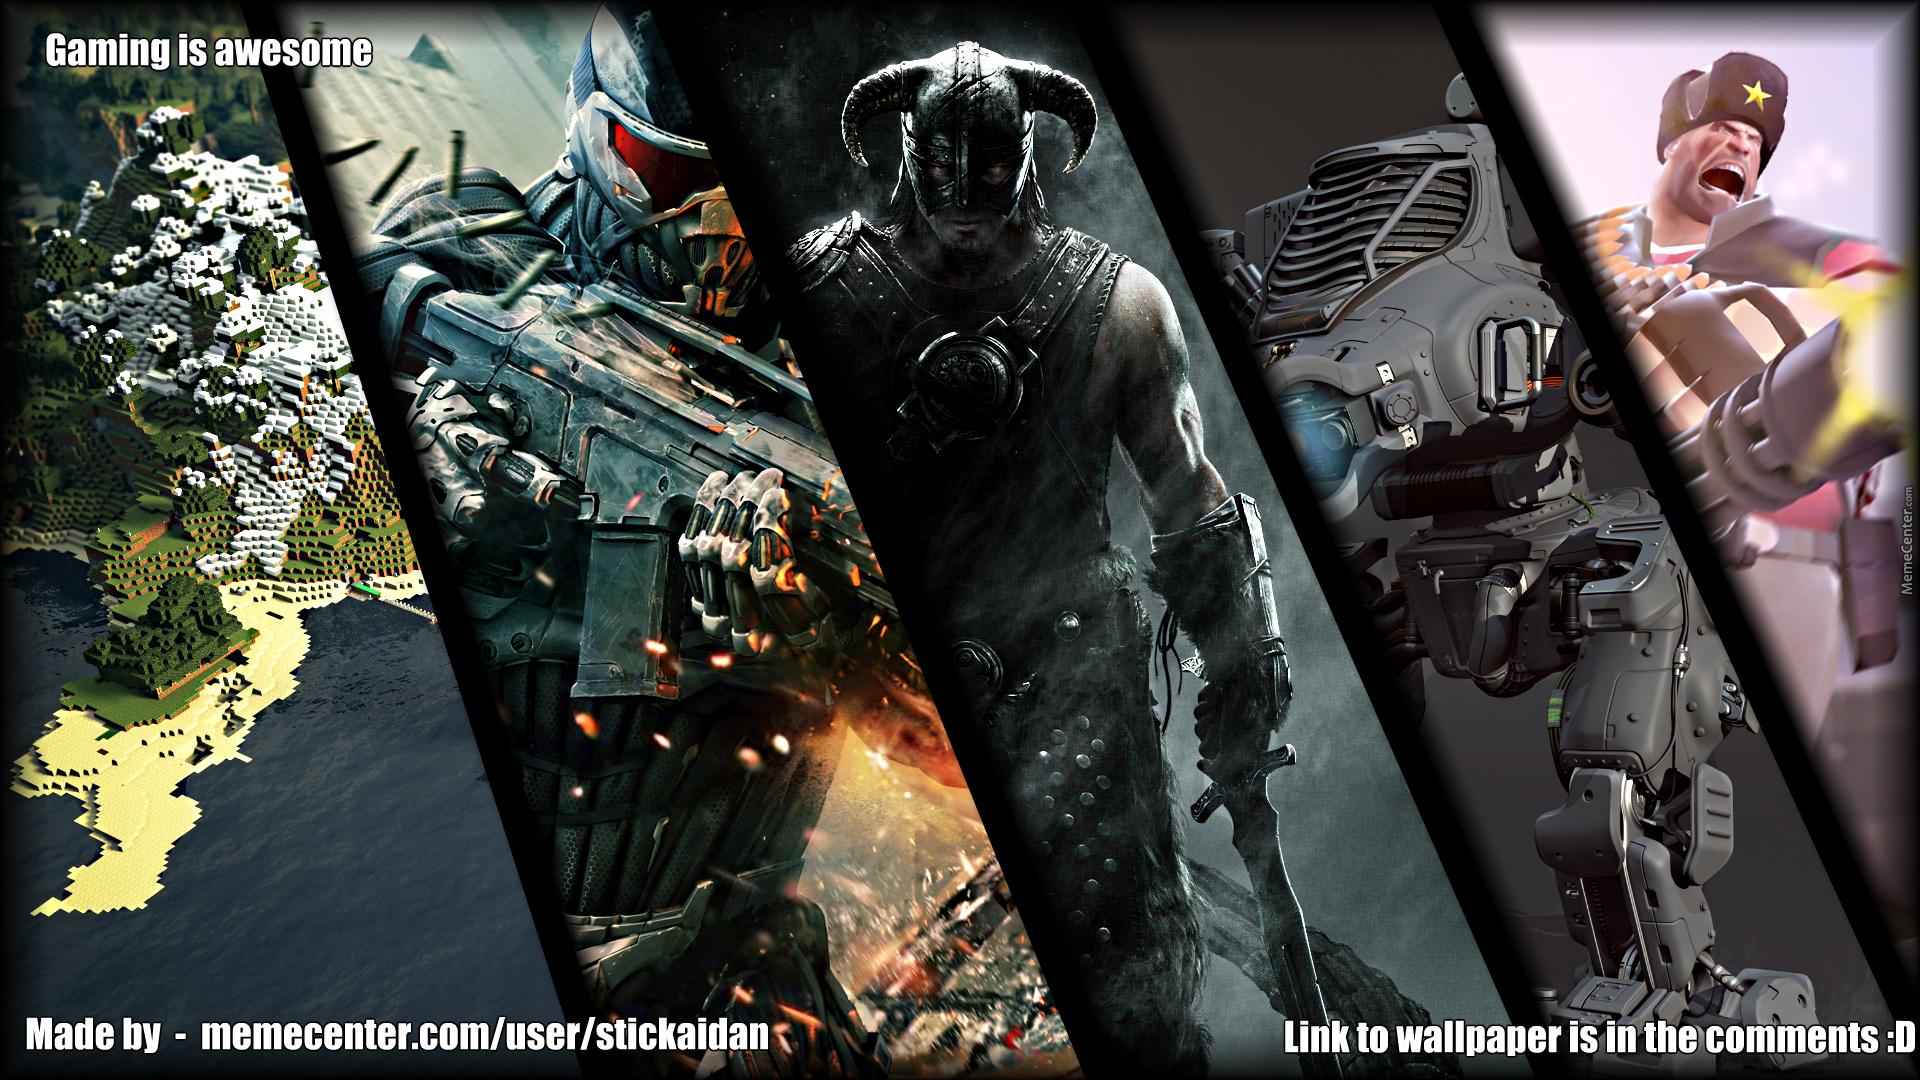 Awesome gaming desktop wallpaper wallpapersafari - Gaming wallpaper ...